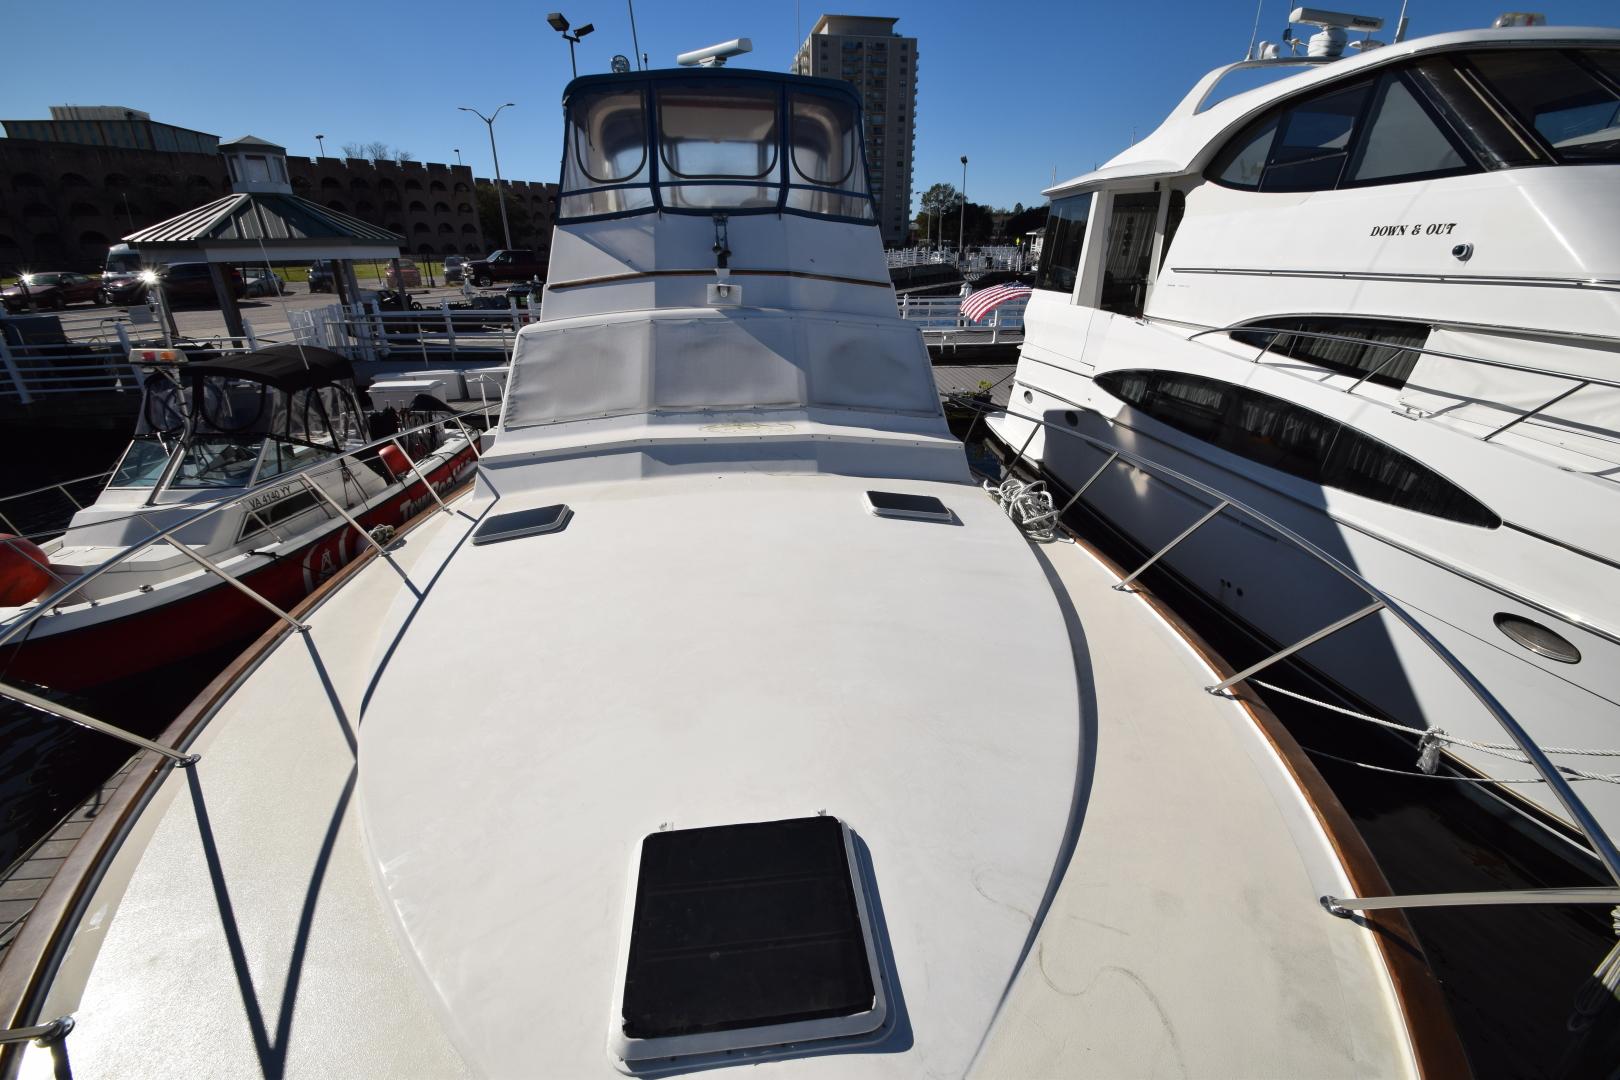 Ocean Yachts-46 Sunliner 1986-Sugah Portsmouth-Virginia-United States-1555543 | Thumbnail